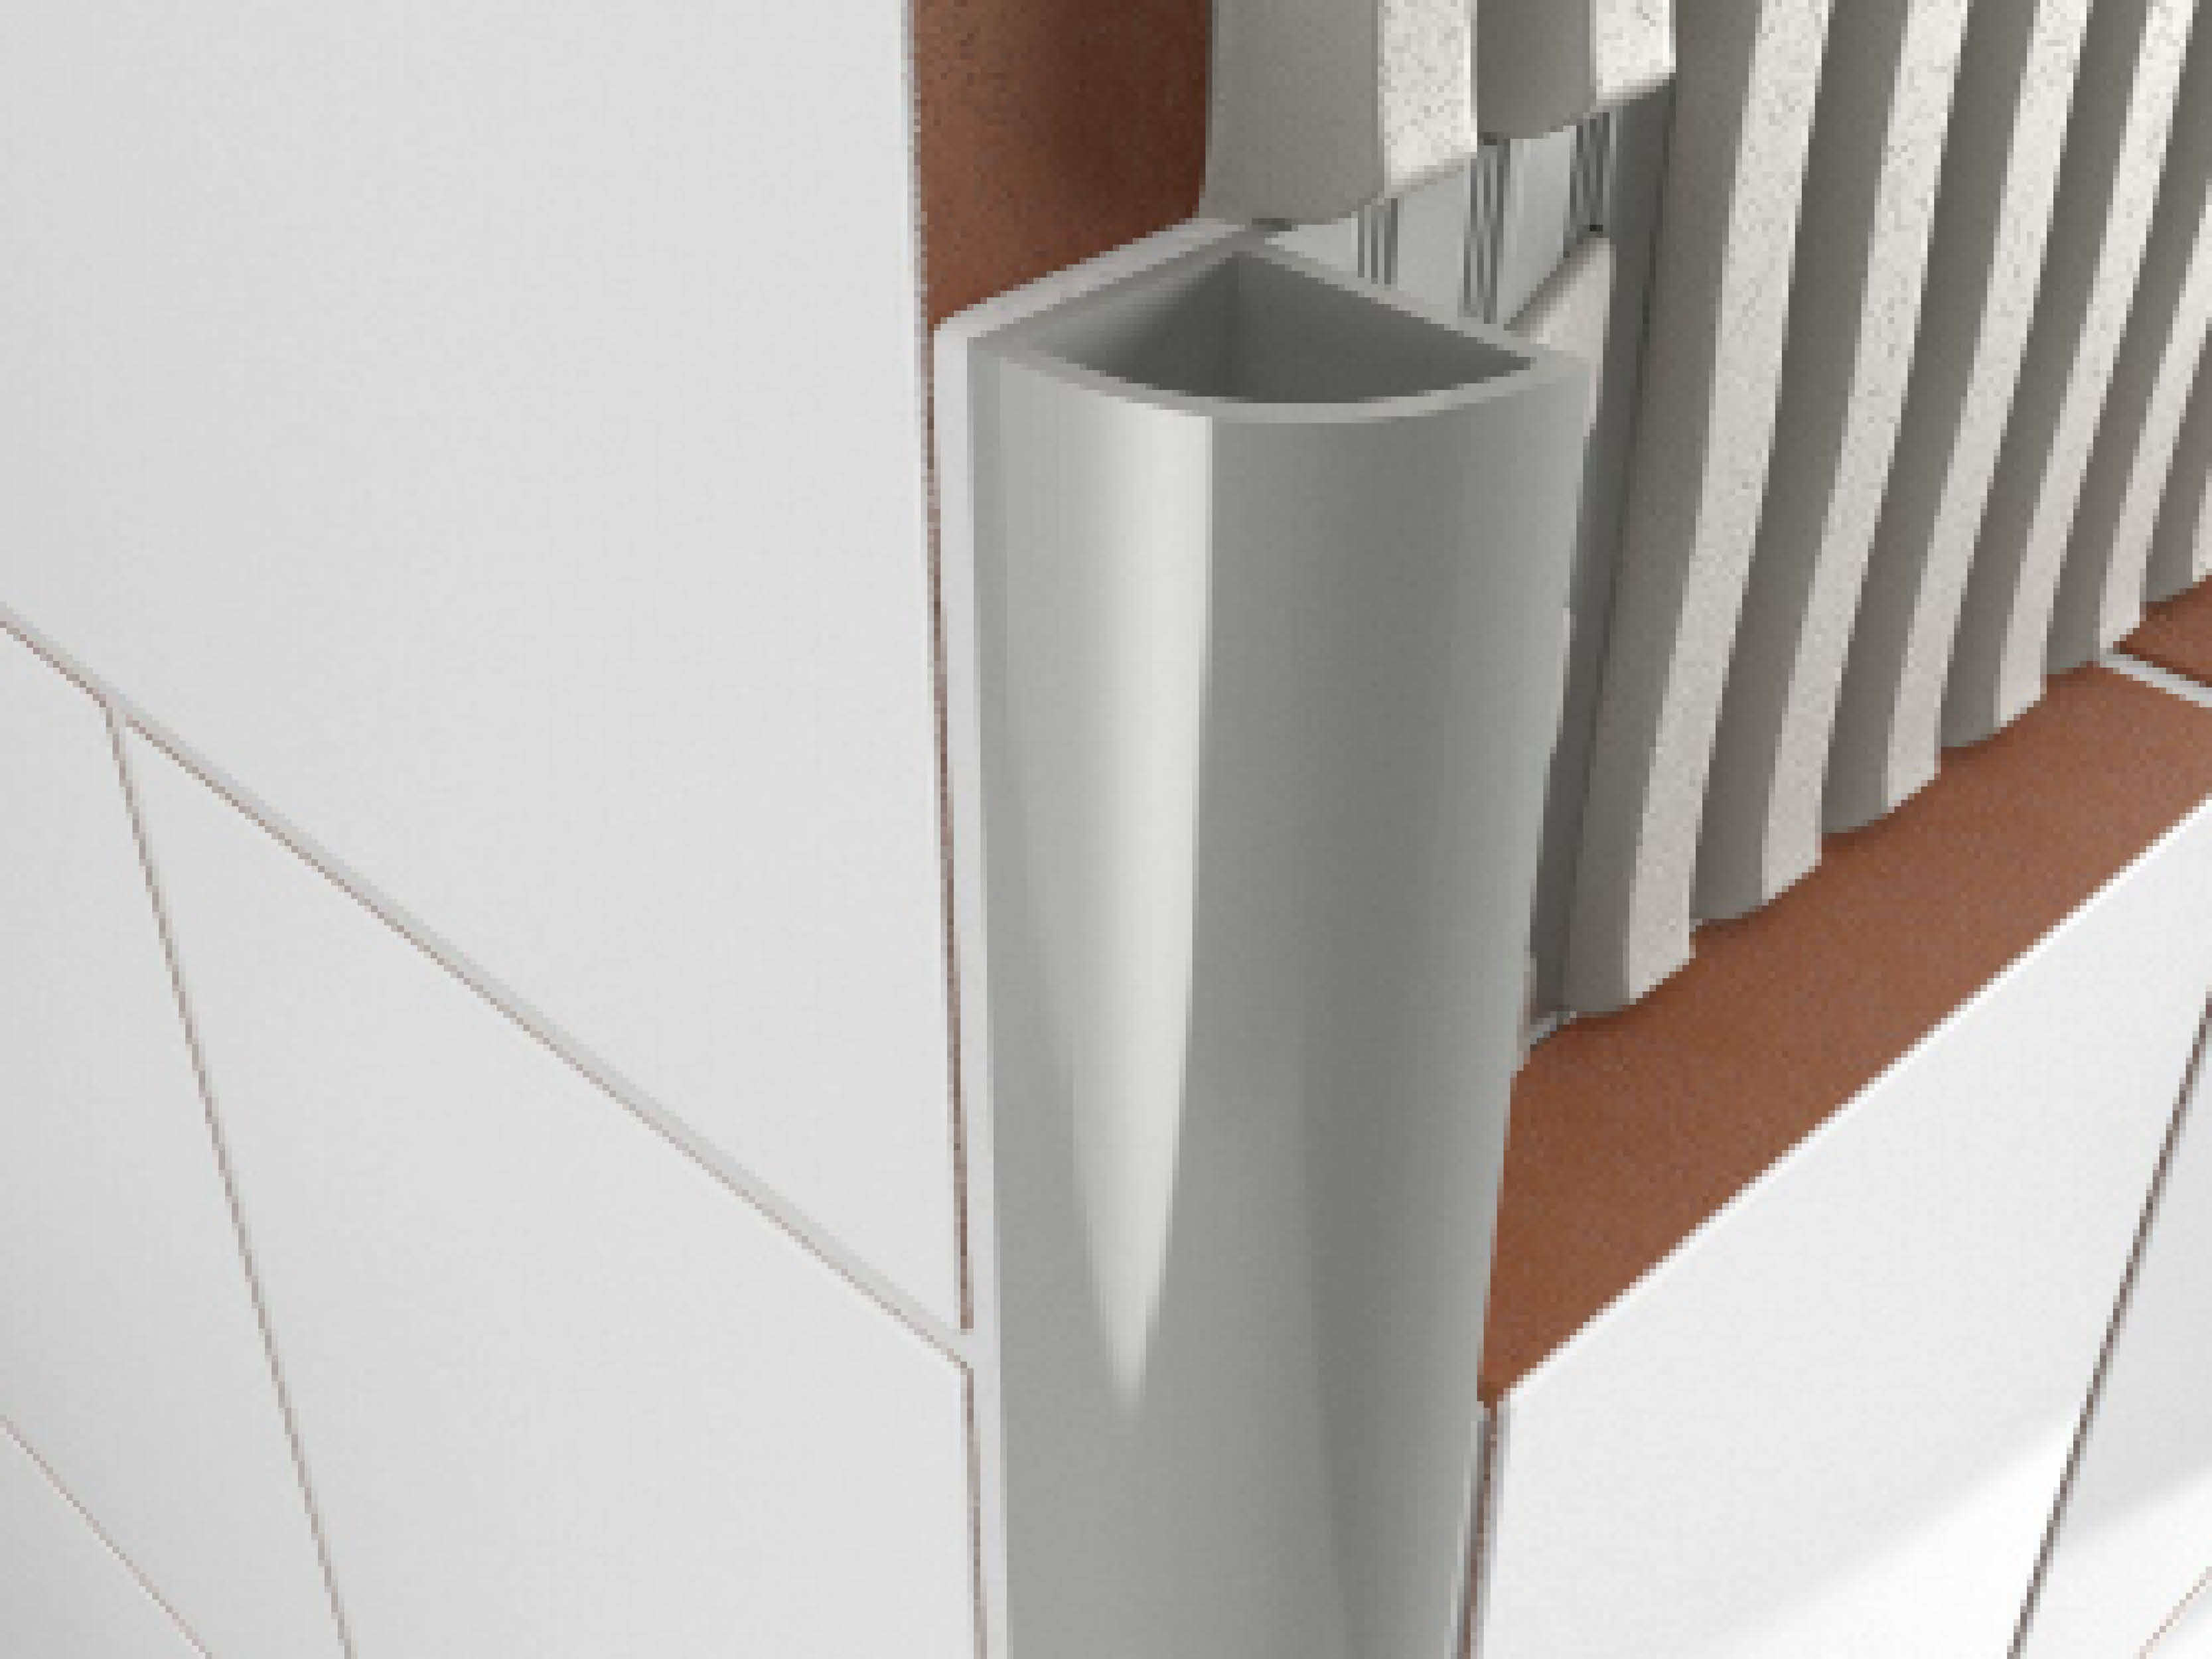 Atrim PVC Round Profile 2.5m